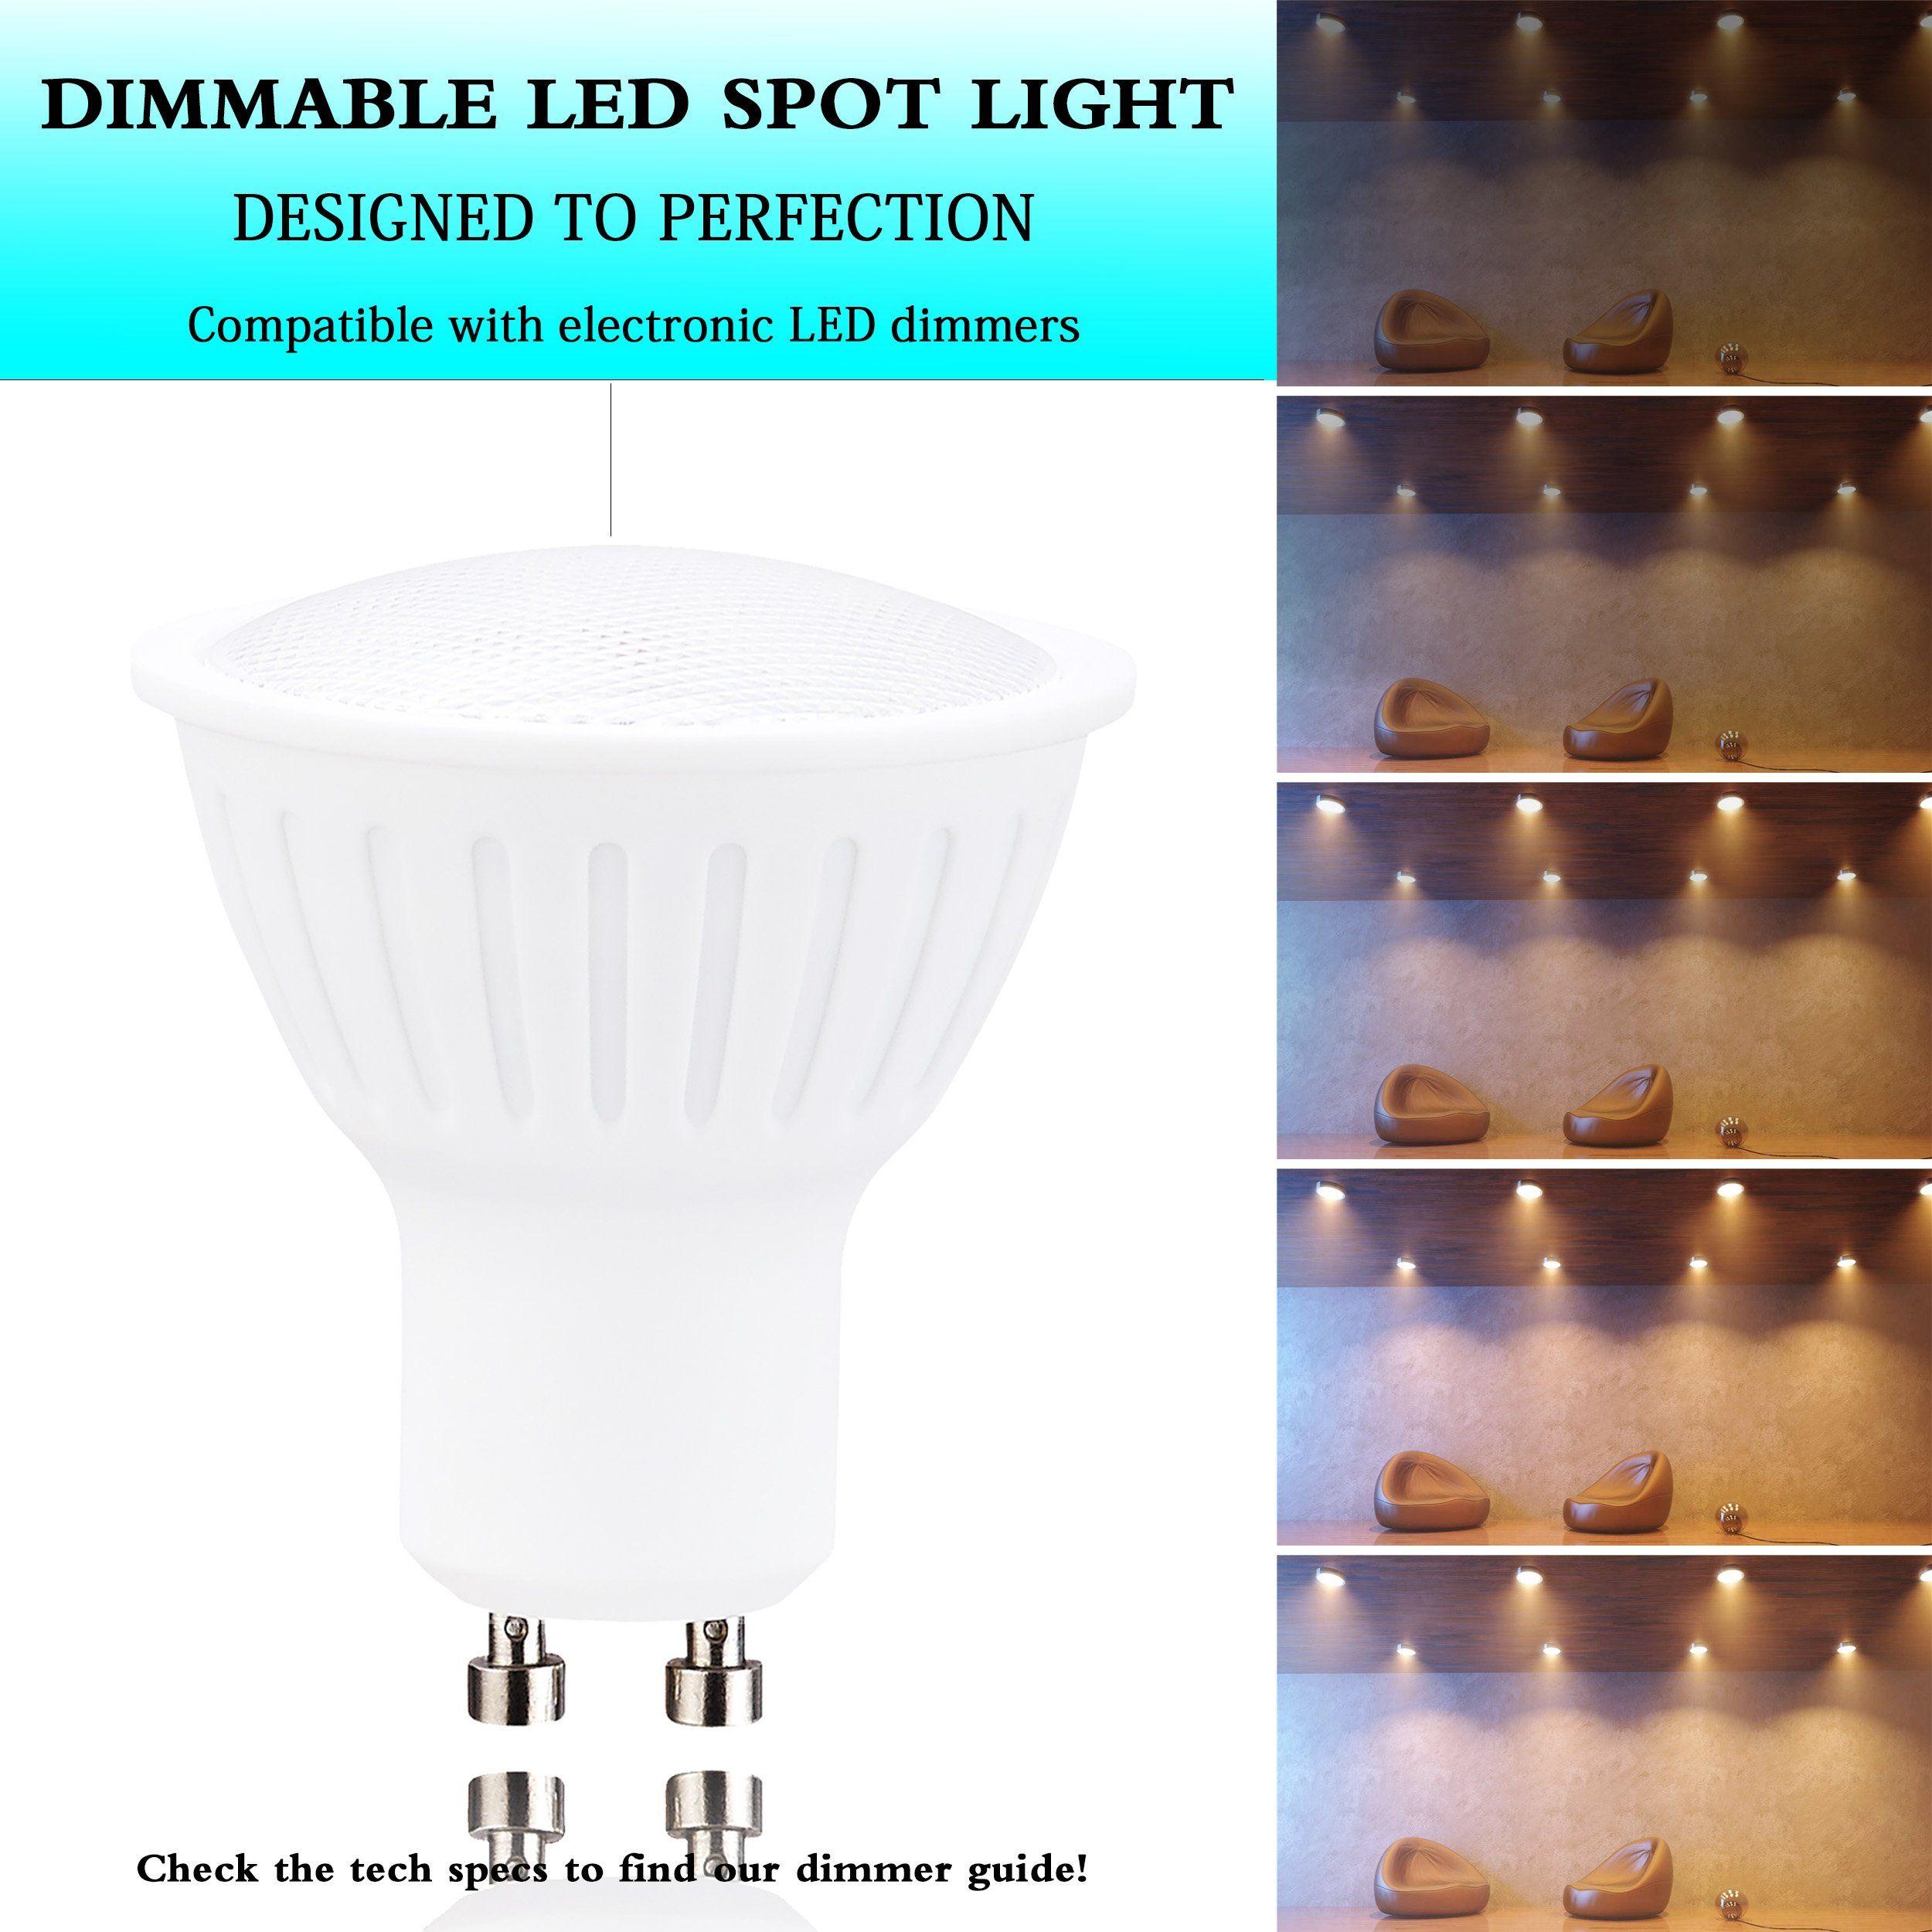 Gu10 Led Par16 Spot Light Warm White 3000k Dimmable25watt Halogen Equivalent3w Recessed Lights 300lumens 120a Beam Angl Recessed Lighting Spotlight Bulbs Bulb